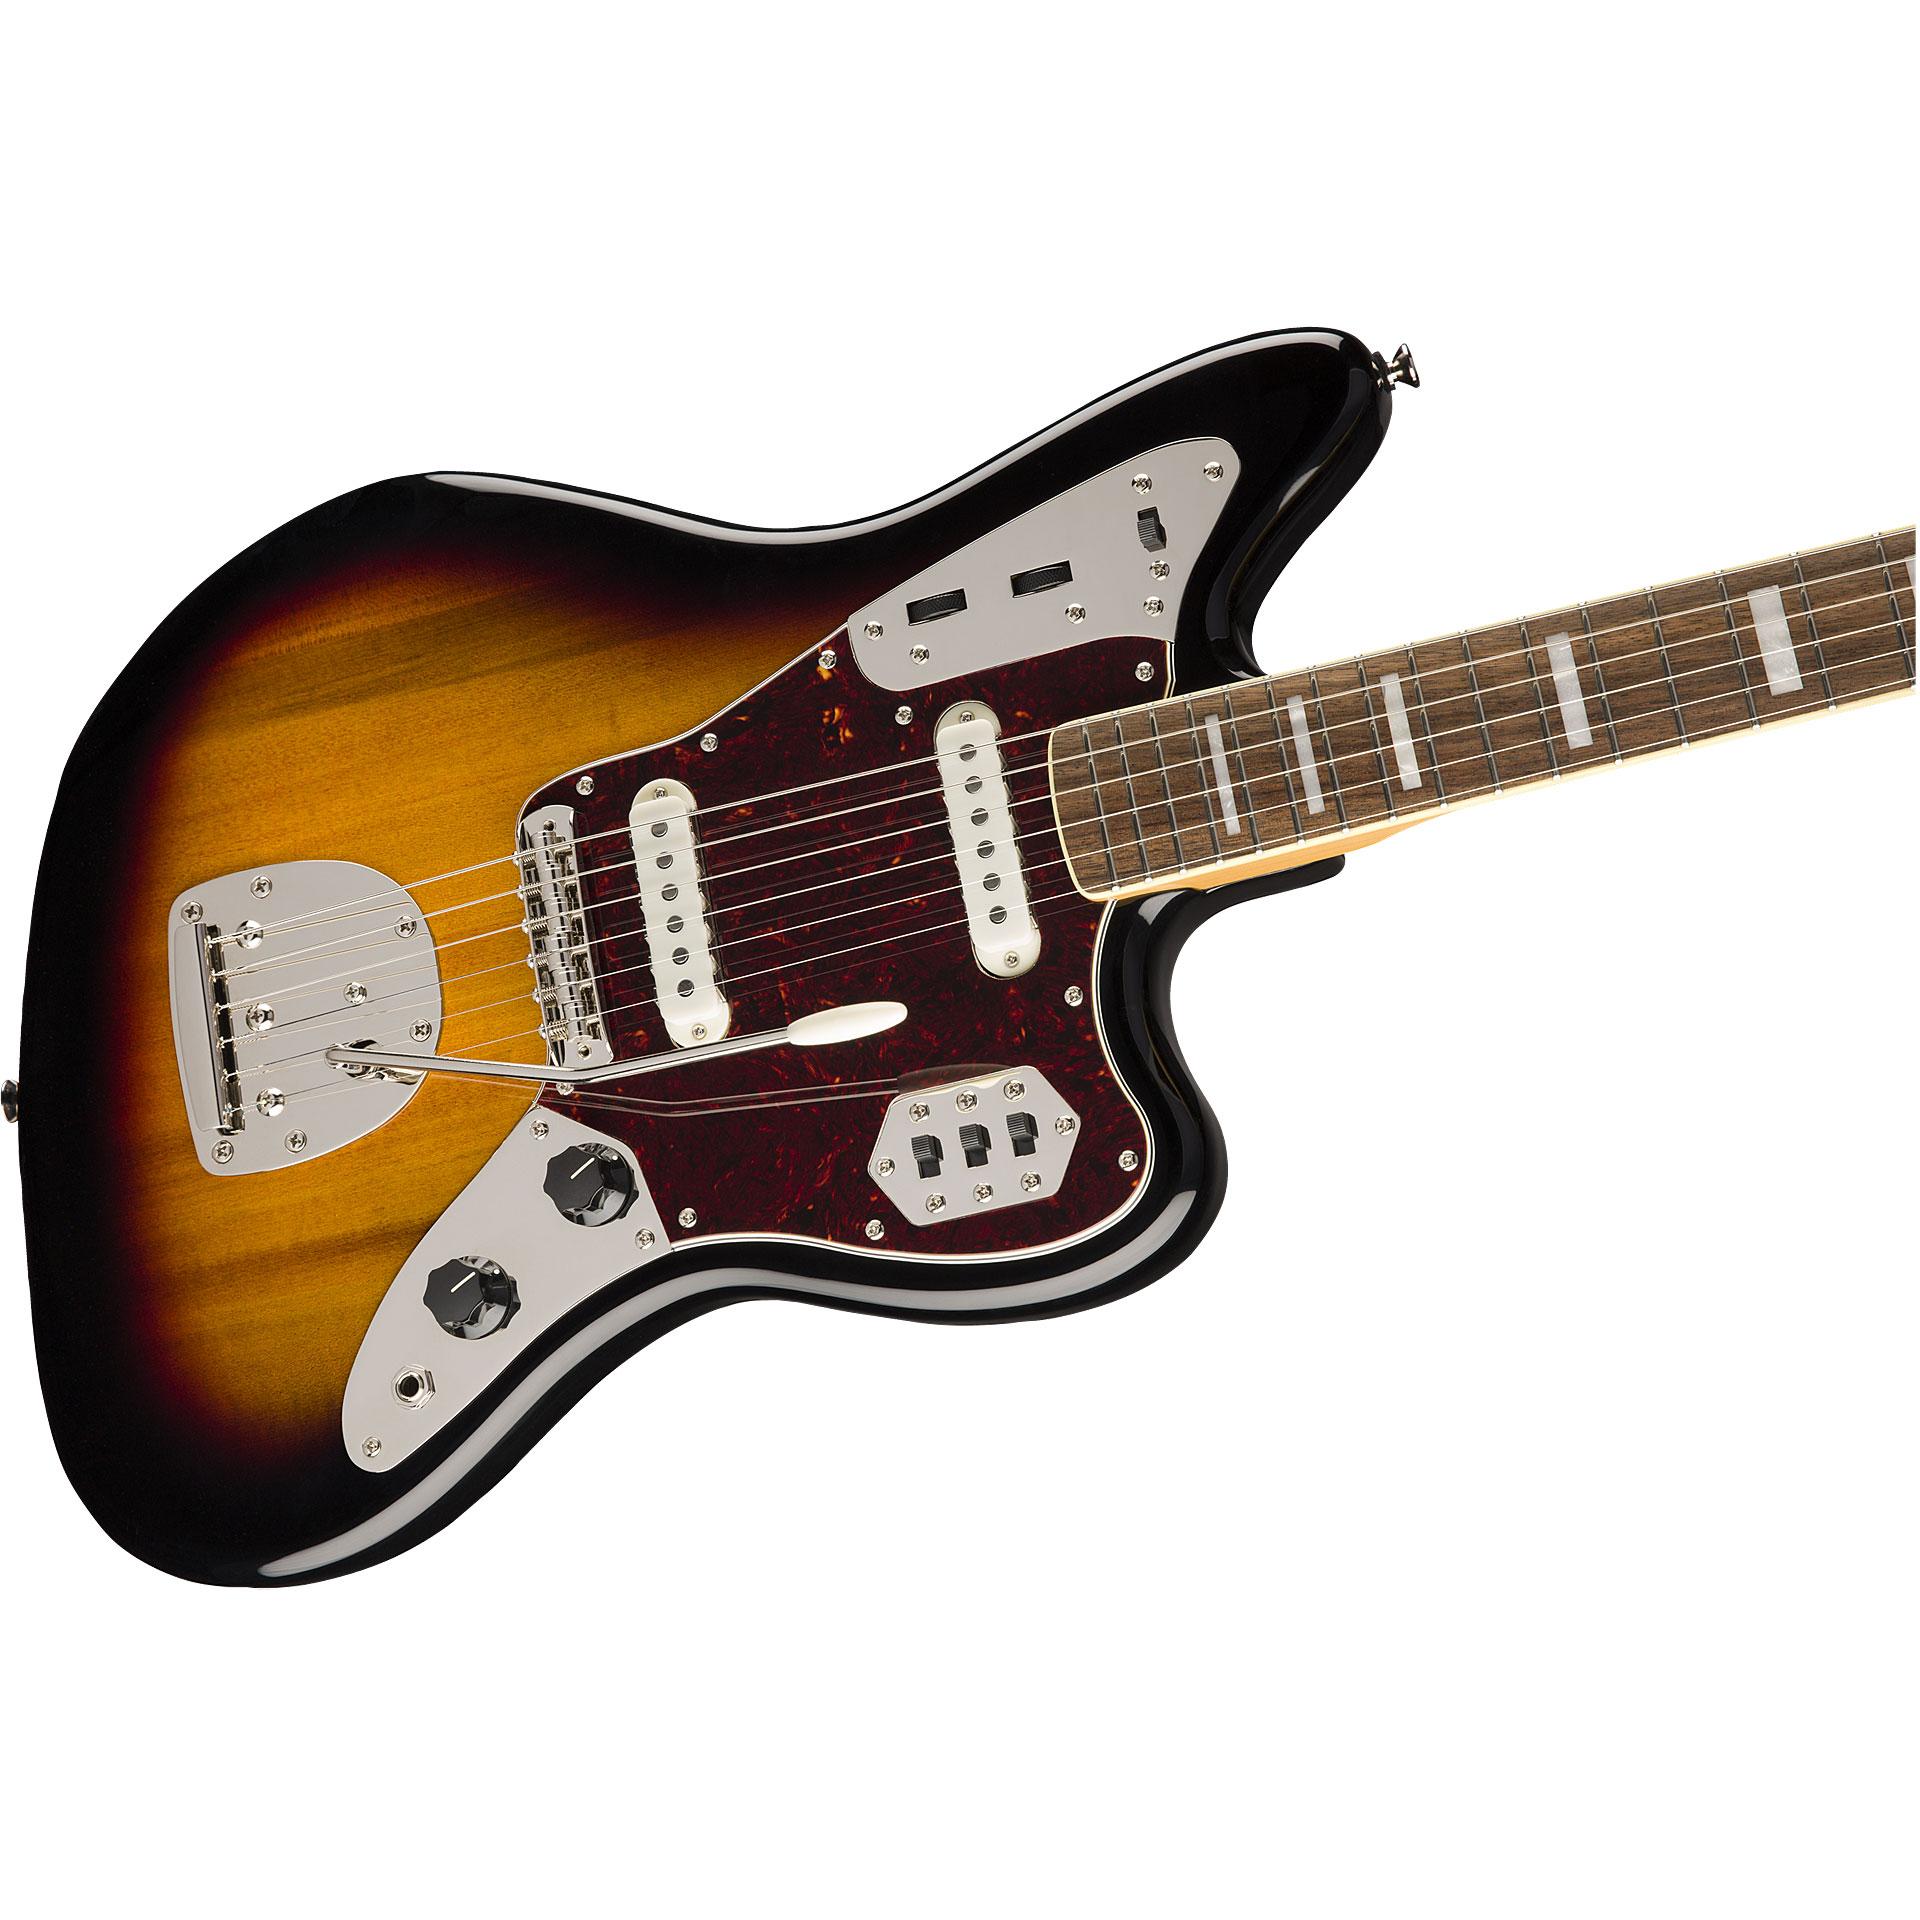 squier classic vibe 70s jaguar 3ts electric guitar. Black Bedroom Furniture Sets. Home Design Ideas